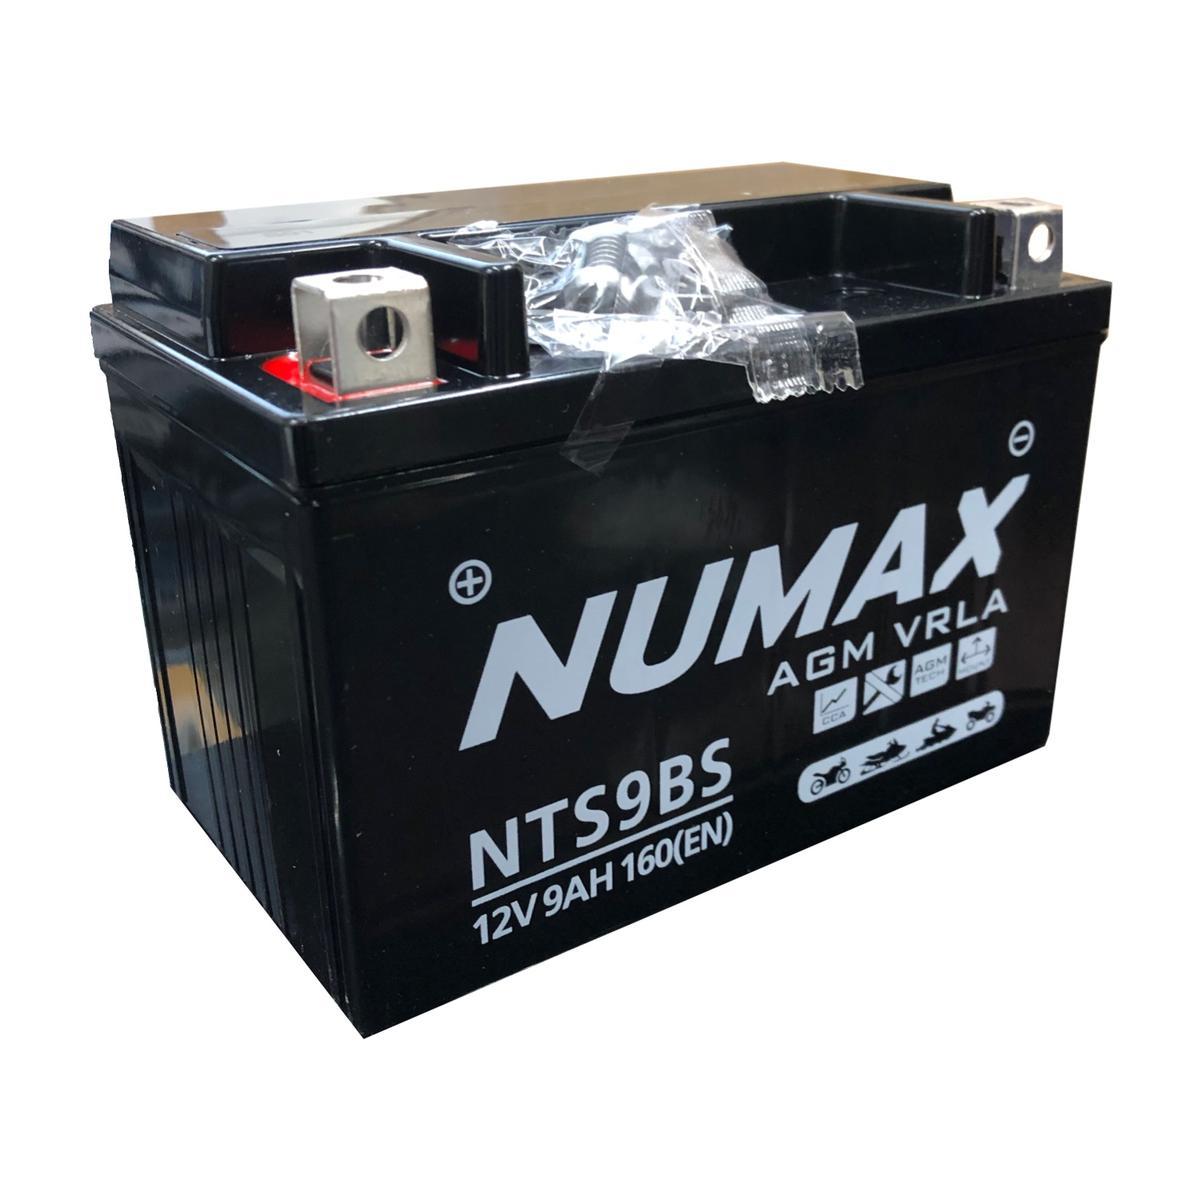 Numax NTS9BS 12v Motorbike Bike Gel Liquifix Battery HONDA 500cc CB500 YXT9-4